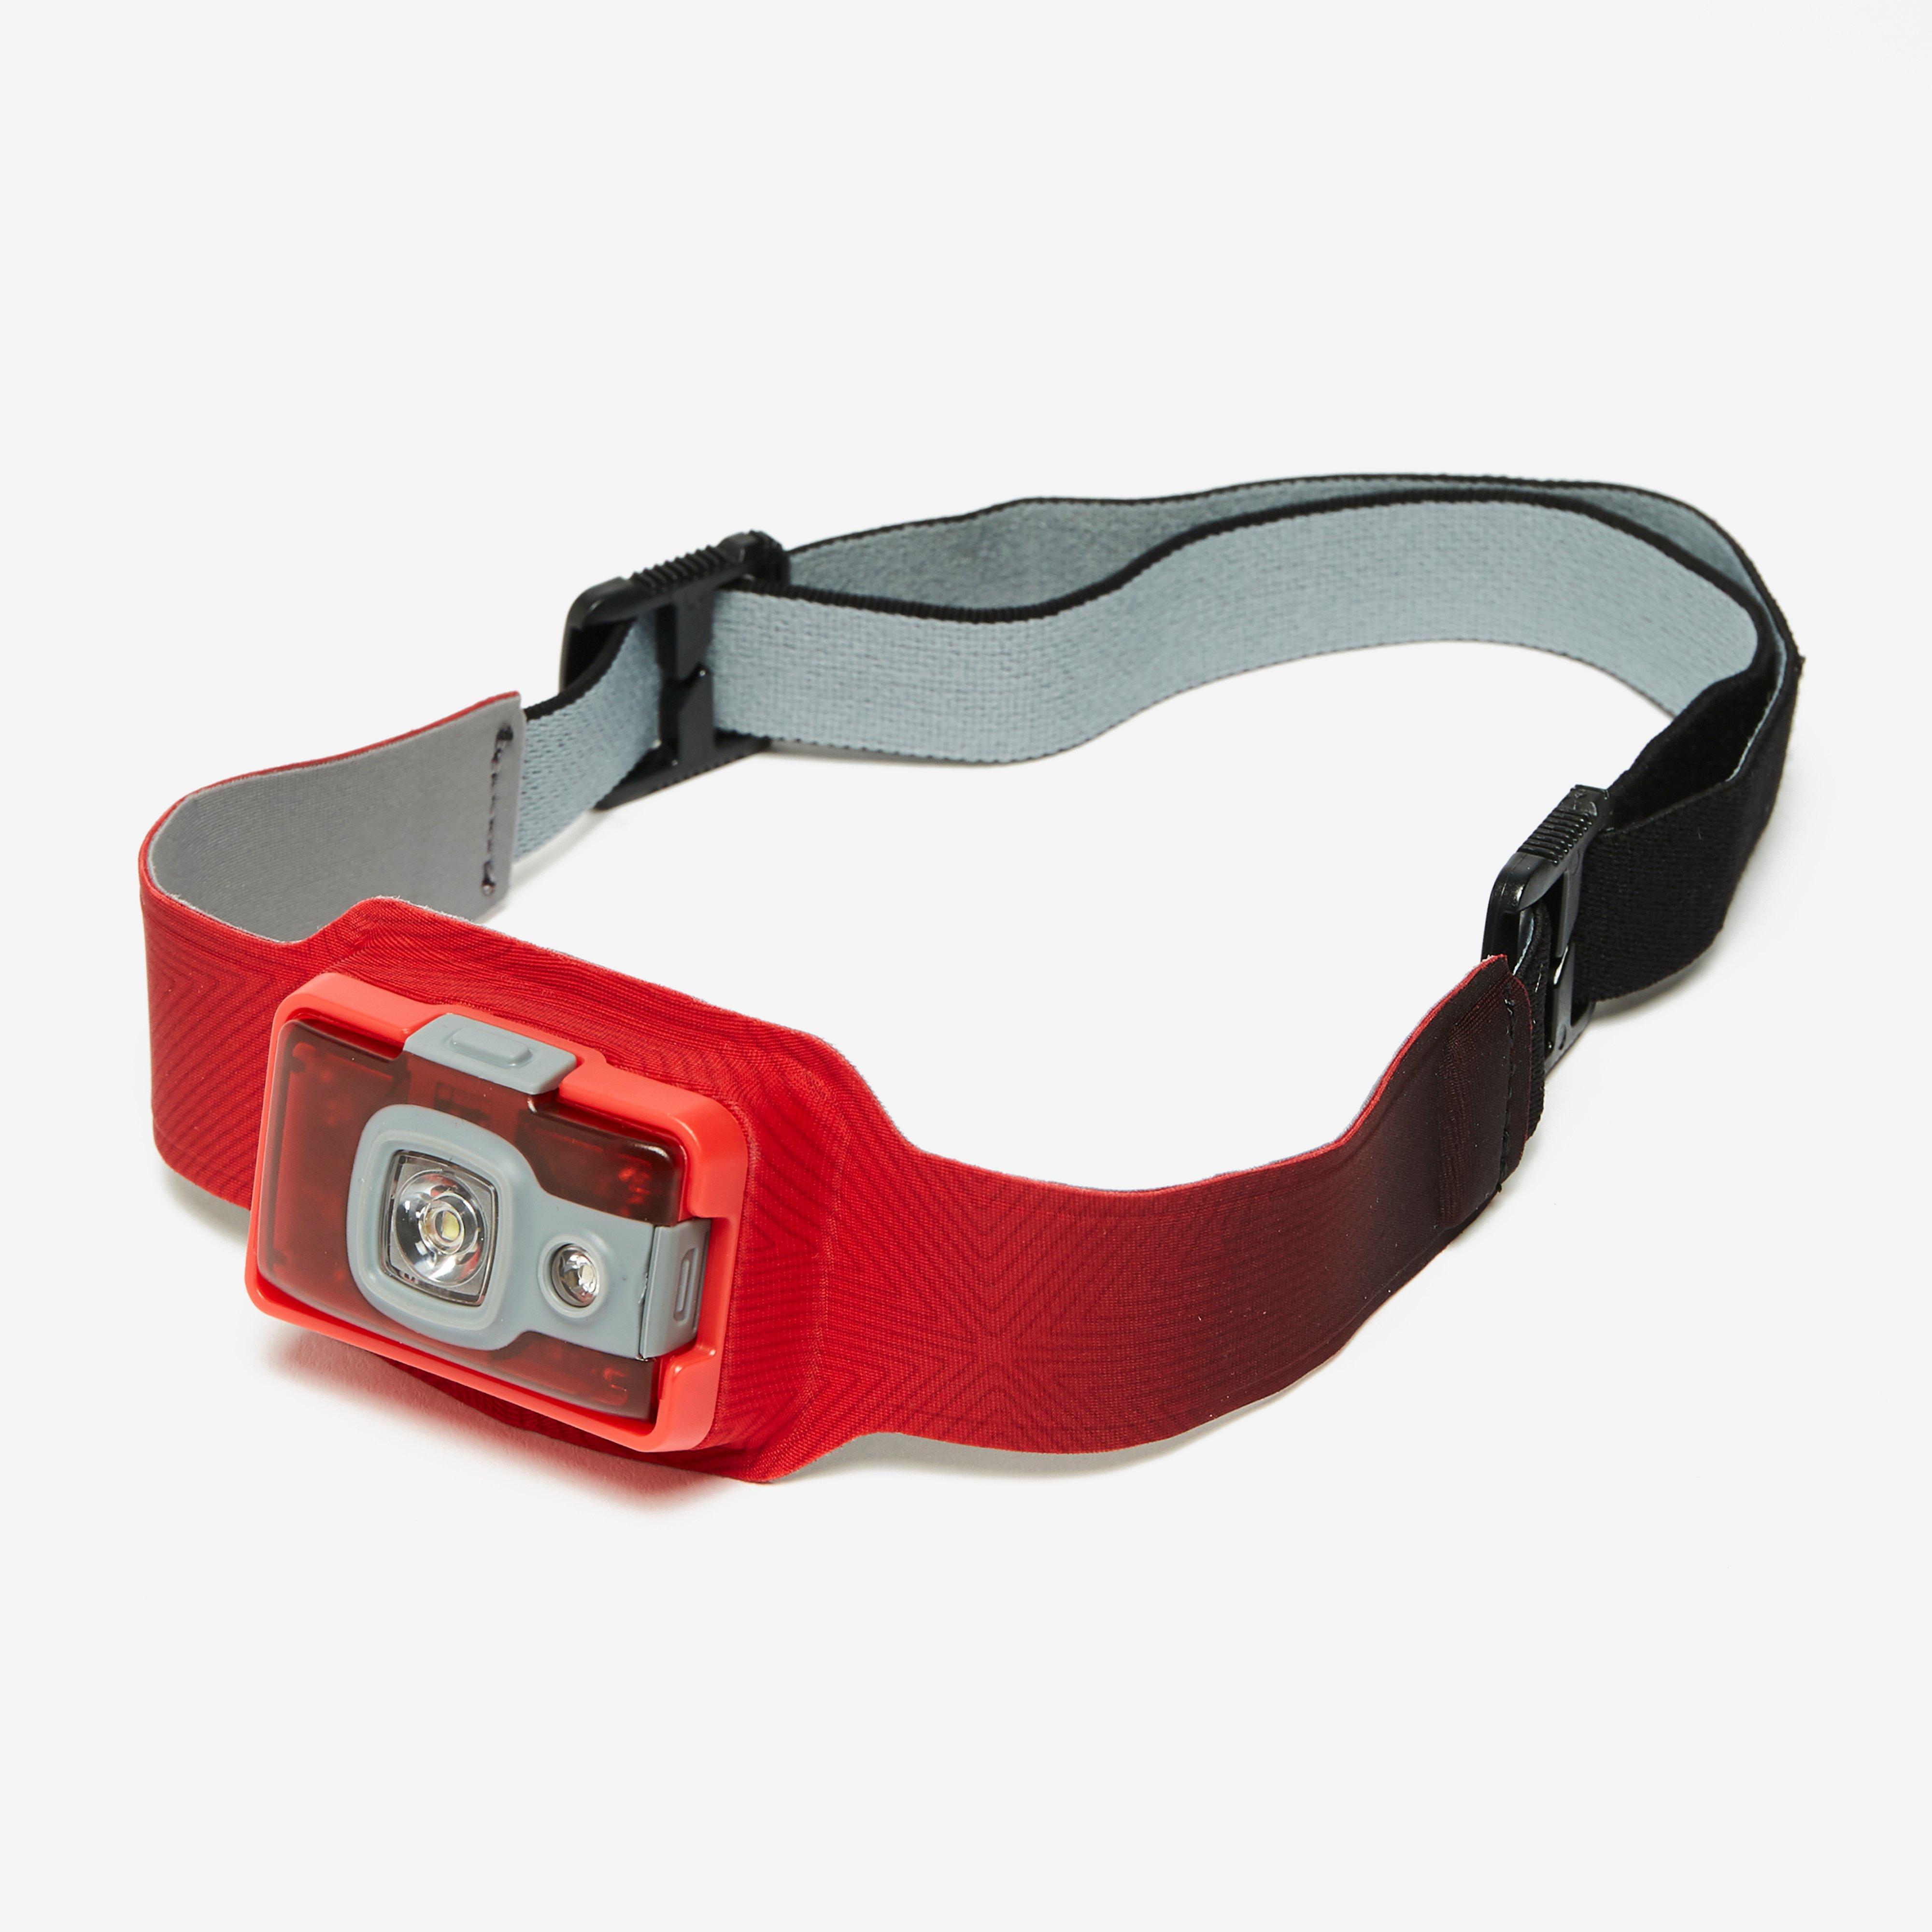 Biolite Headlamp 200 - Red/200  Red/200